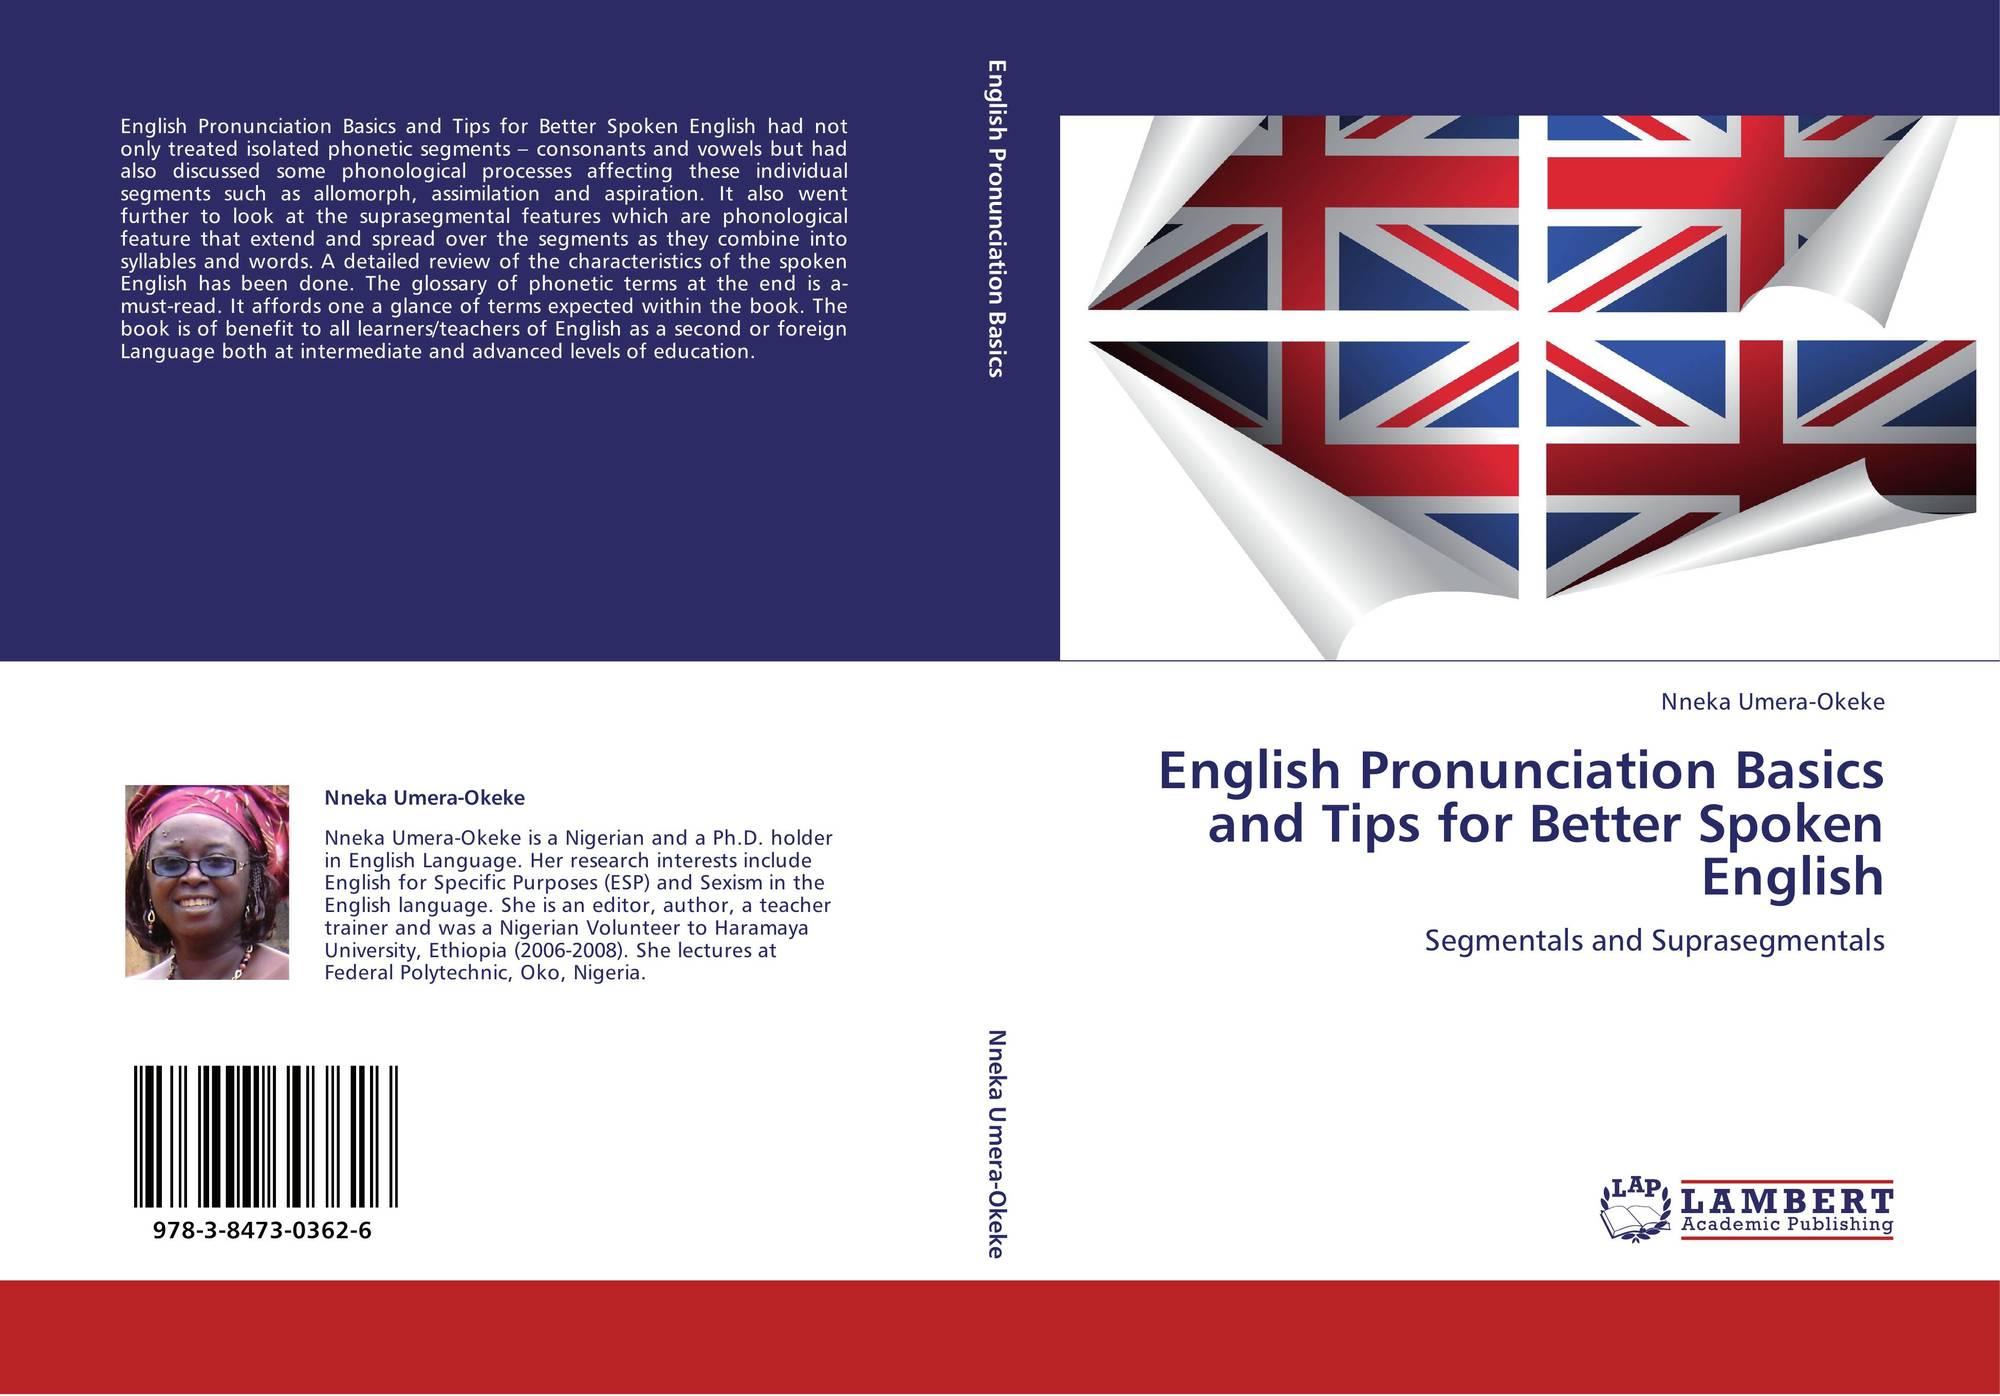 English Pronunciation Basics and Tips for Better Spoken English, 978